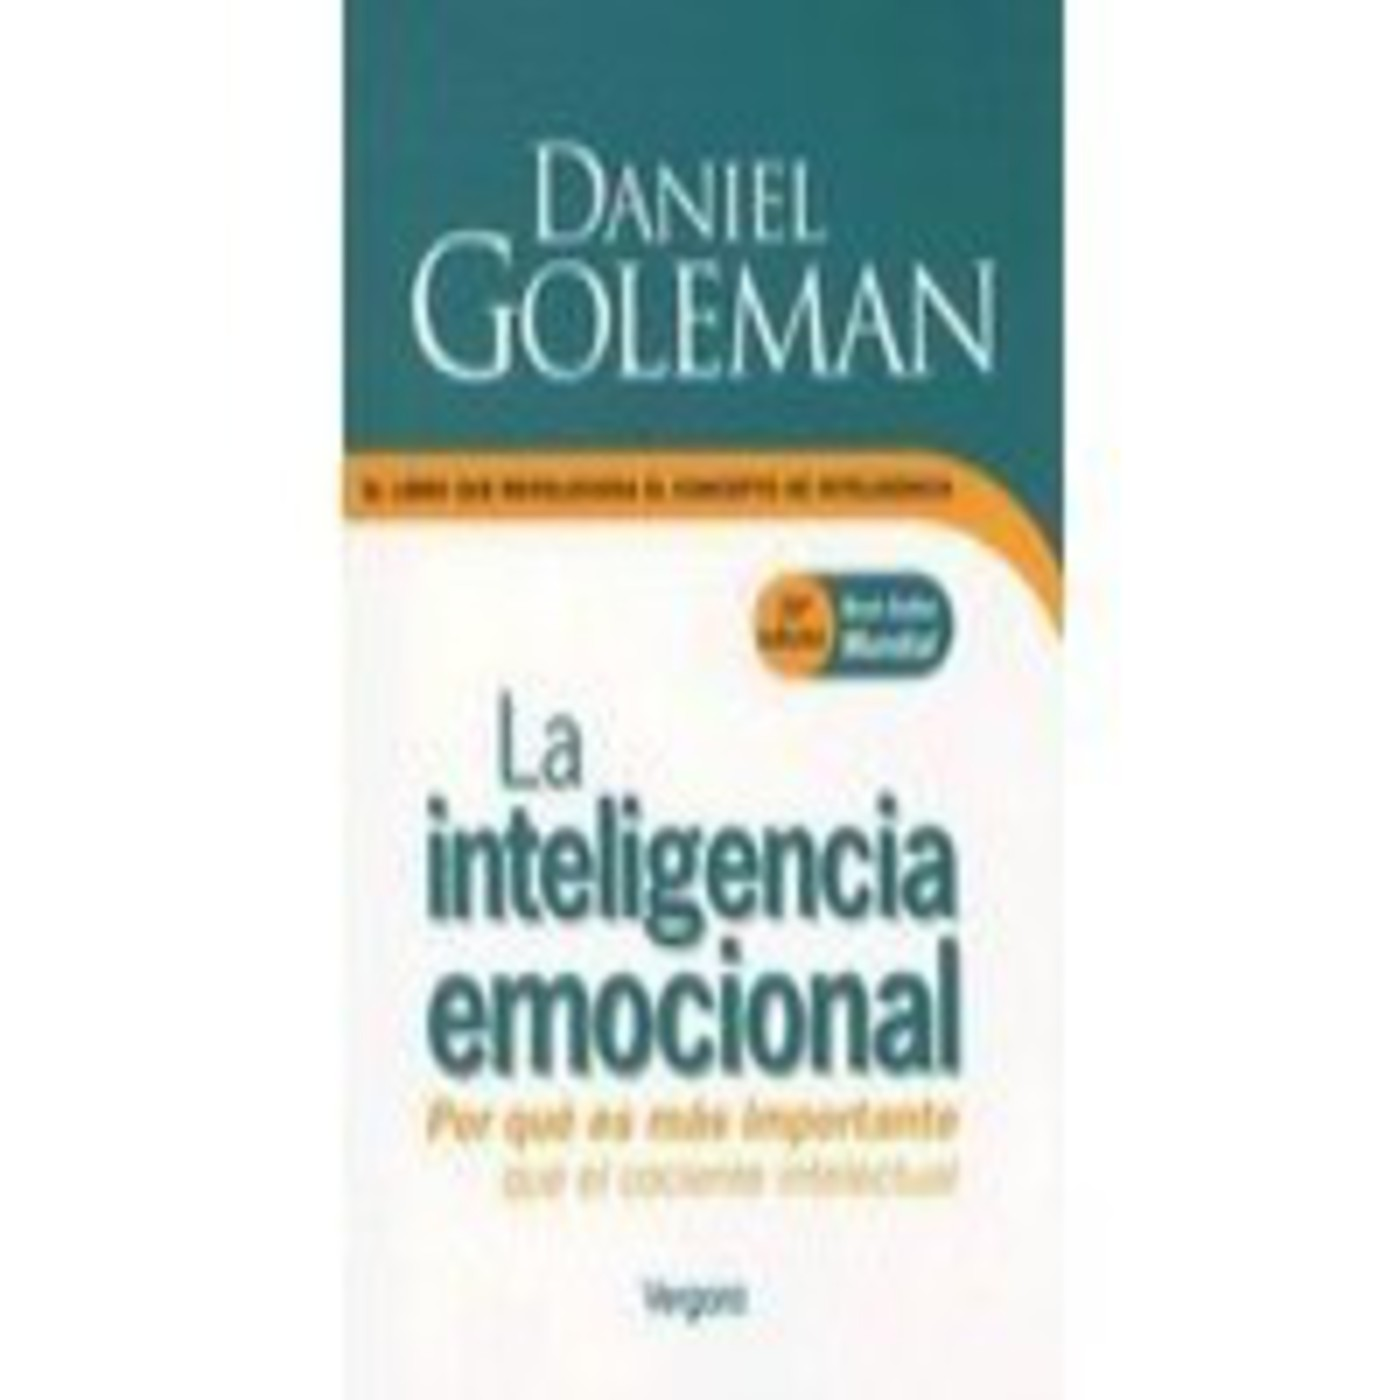 48..INTELIGENCIA EMOCIONAL, Daniel Goleman